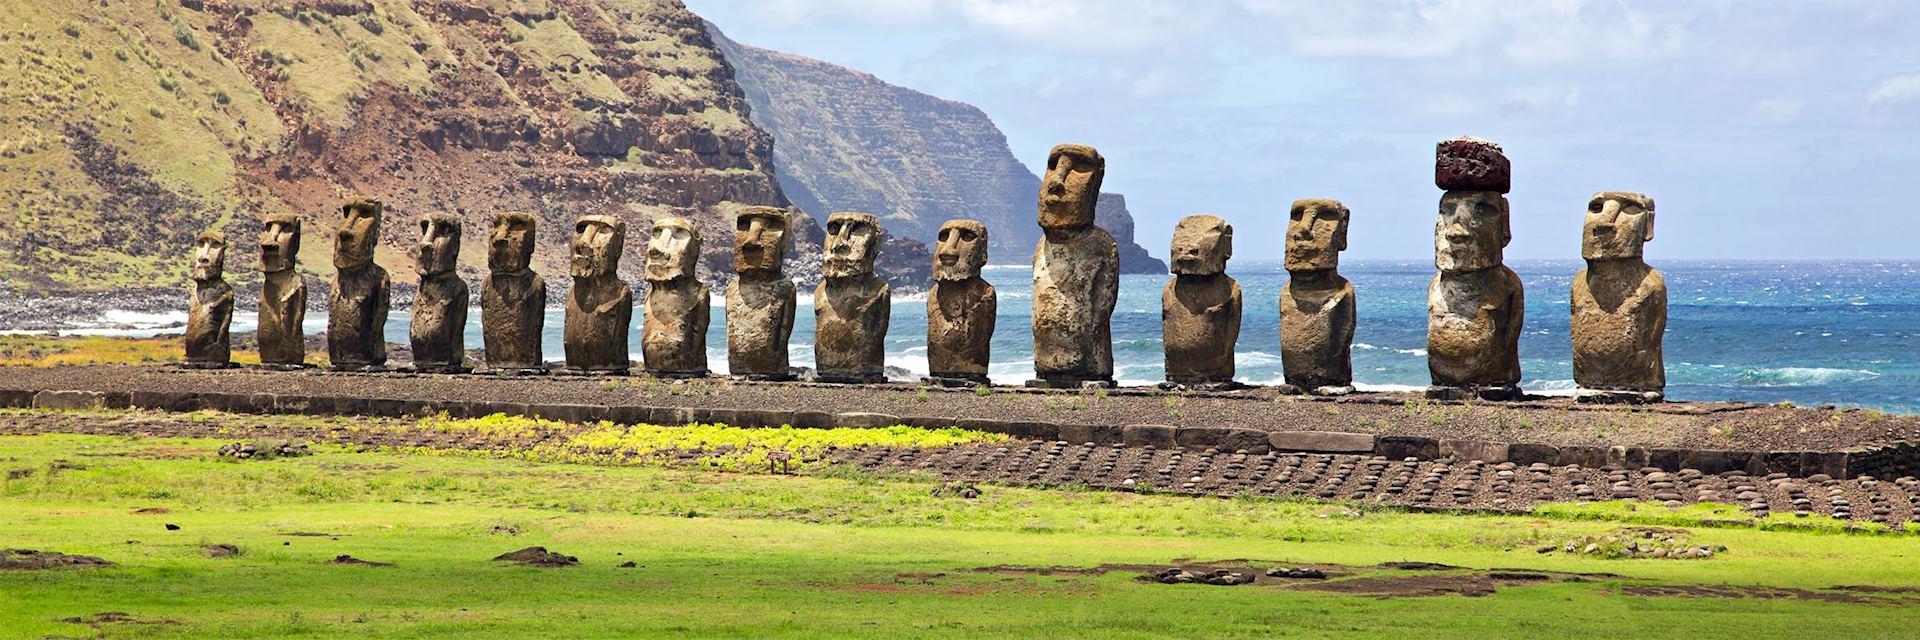 Polynesian Moai statues on Easter Island